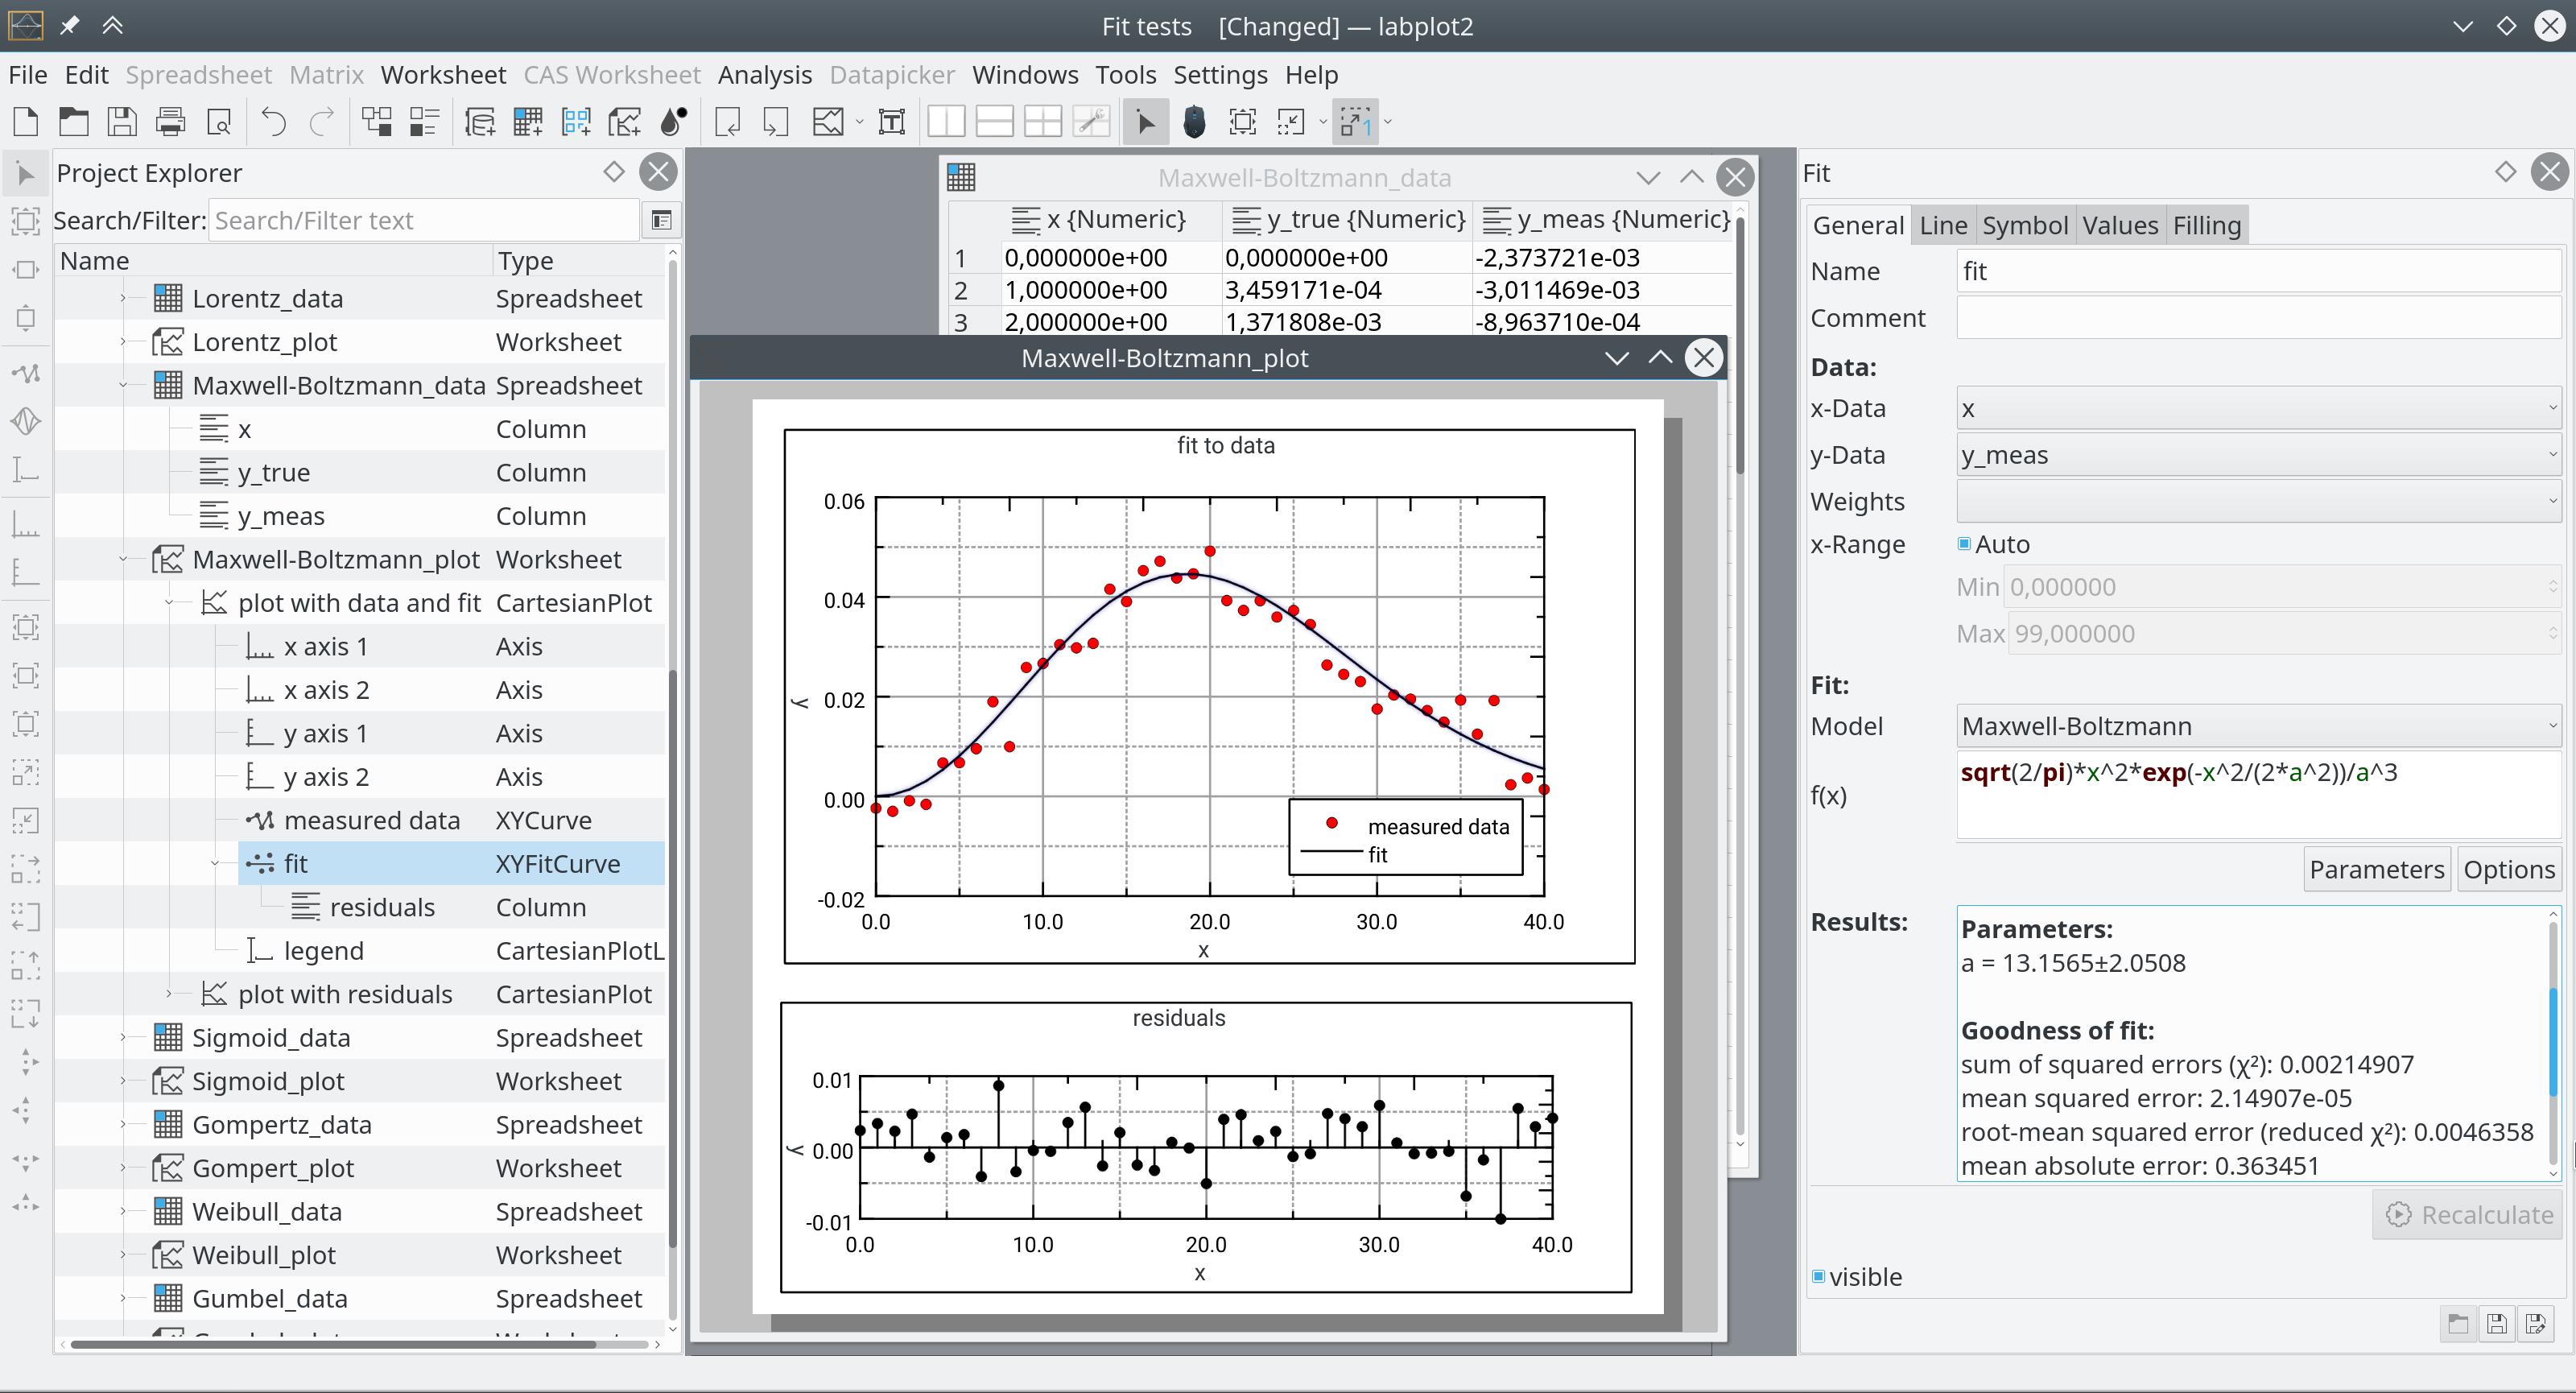 Mate session propertiessktop starta lietotnes labplot2appdata01g ccuart Choice Image